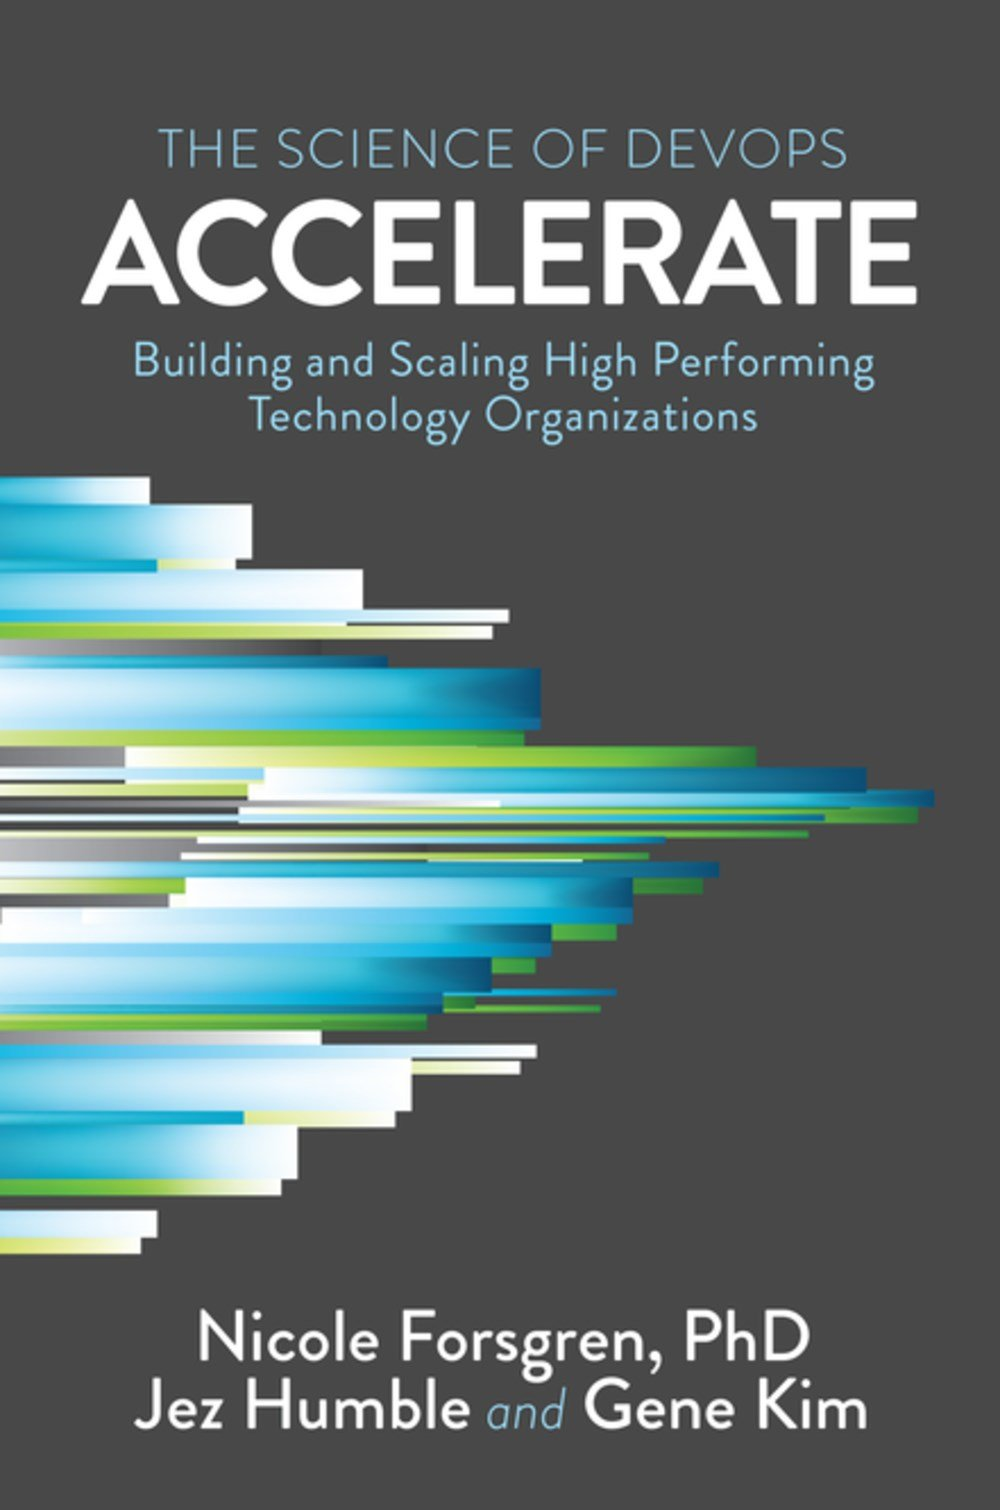 Accelerate Science of DevOps